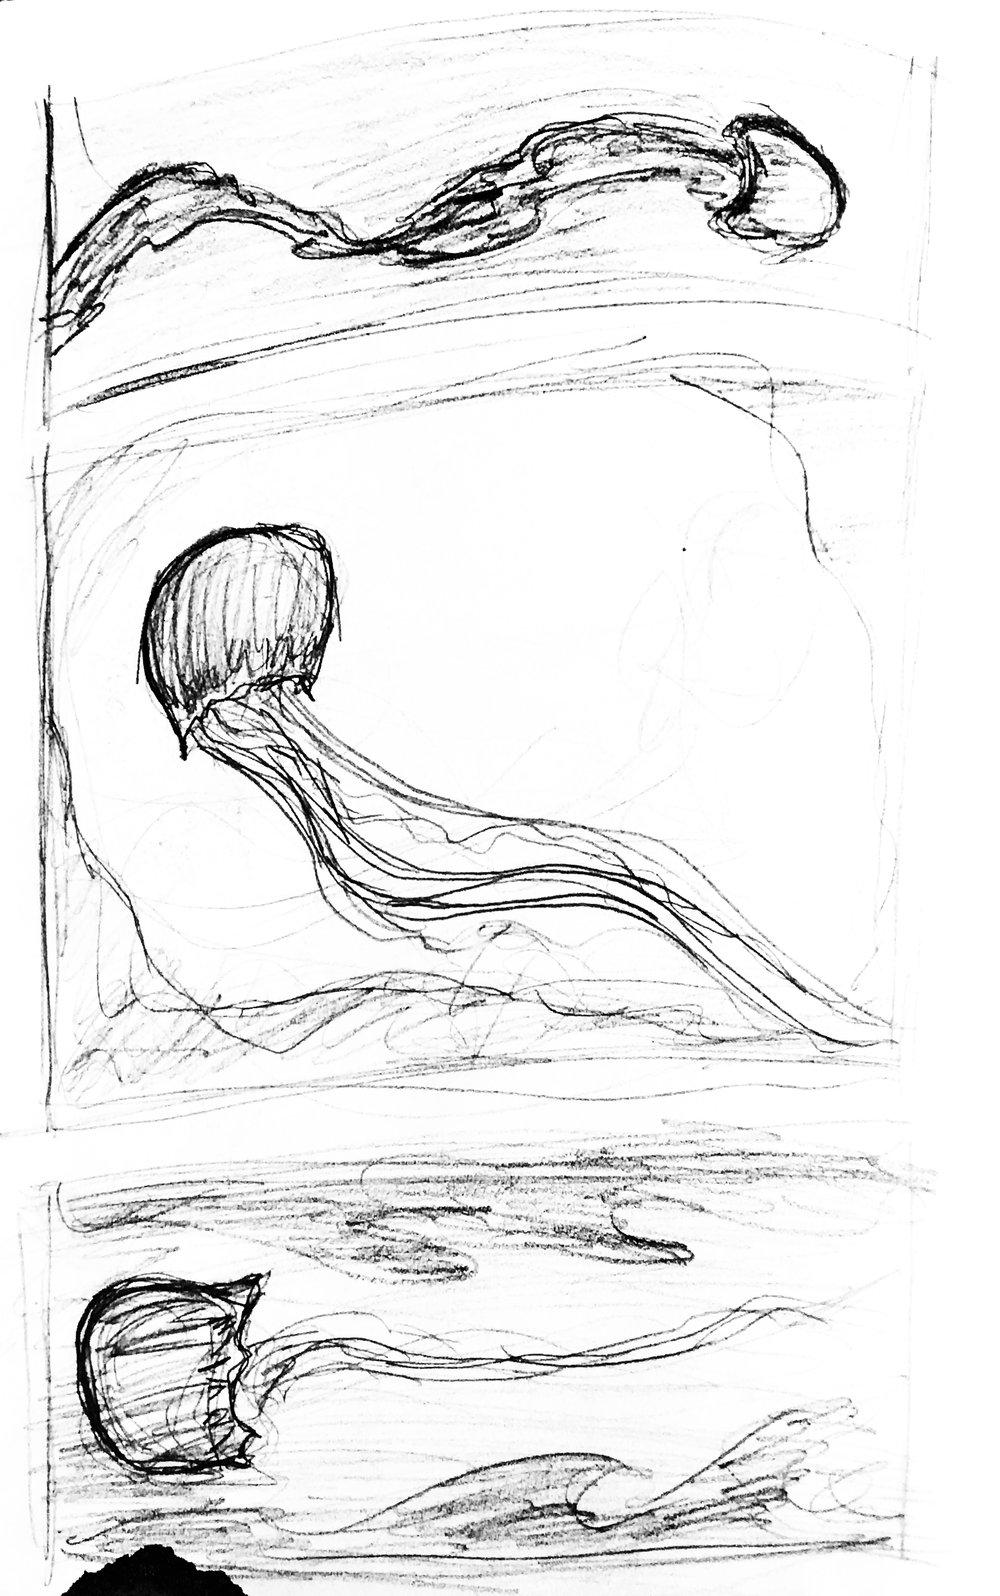 Sketch-Seascape-9.jpg